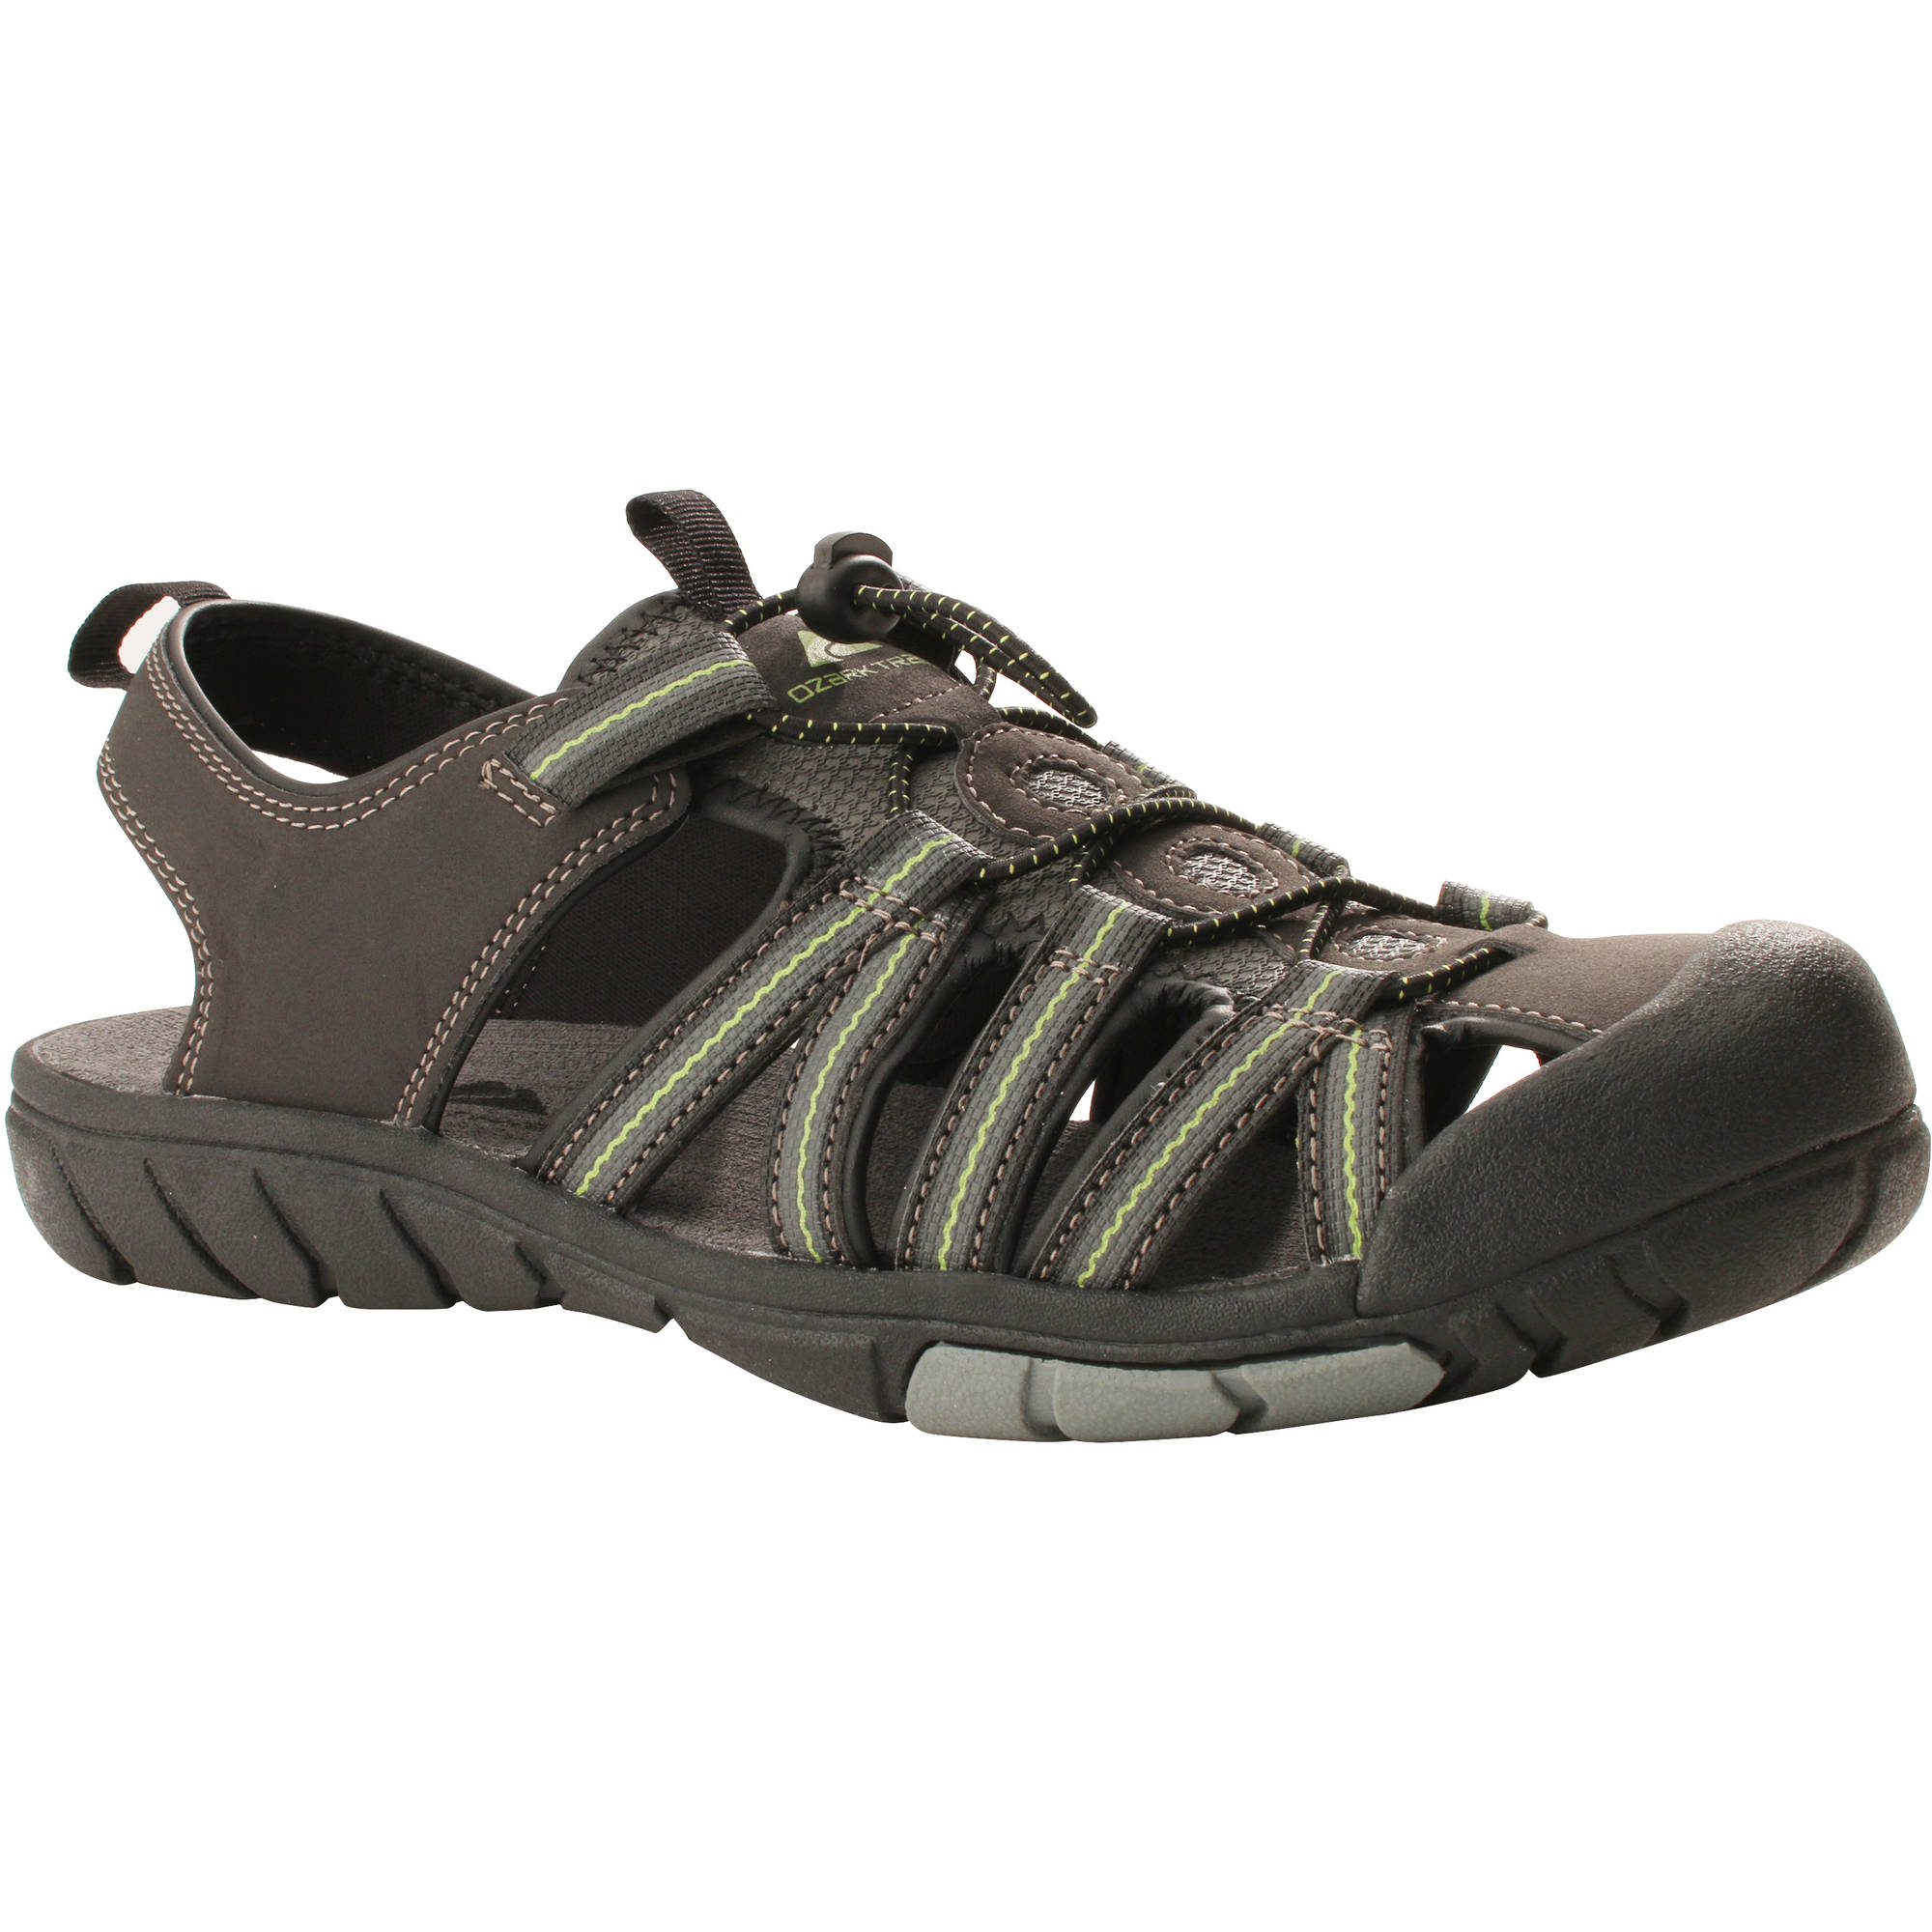 Ozark Trail Men's Bumptoe Sandal